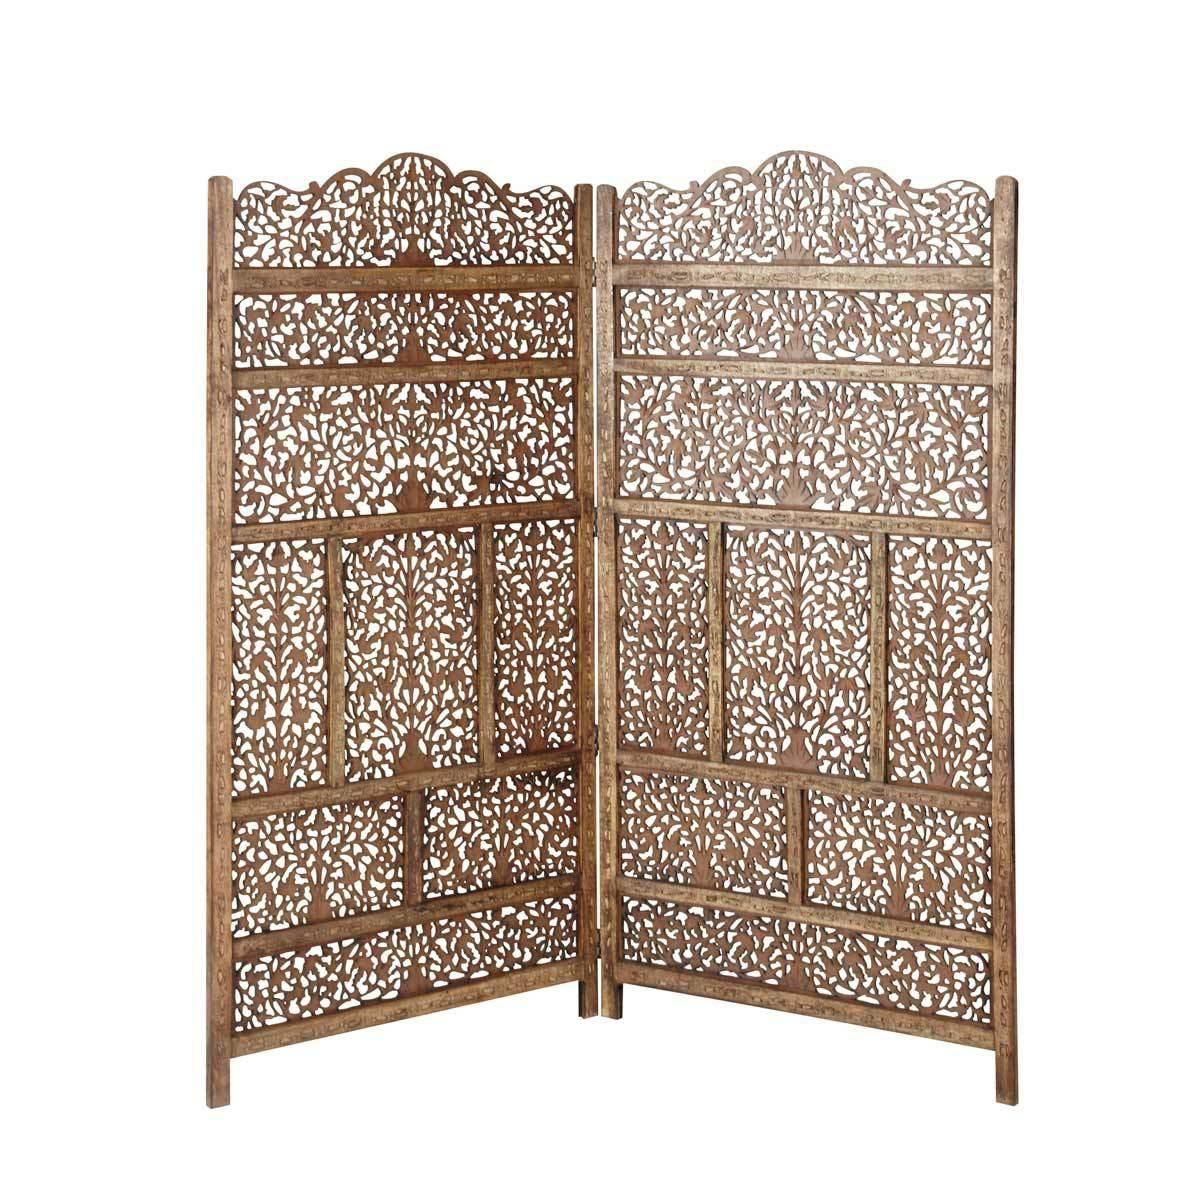 Alhambra wood headboard 160 cm | Maisons du Monde | beds ...